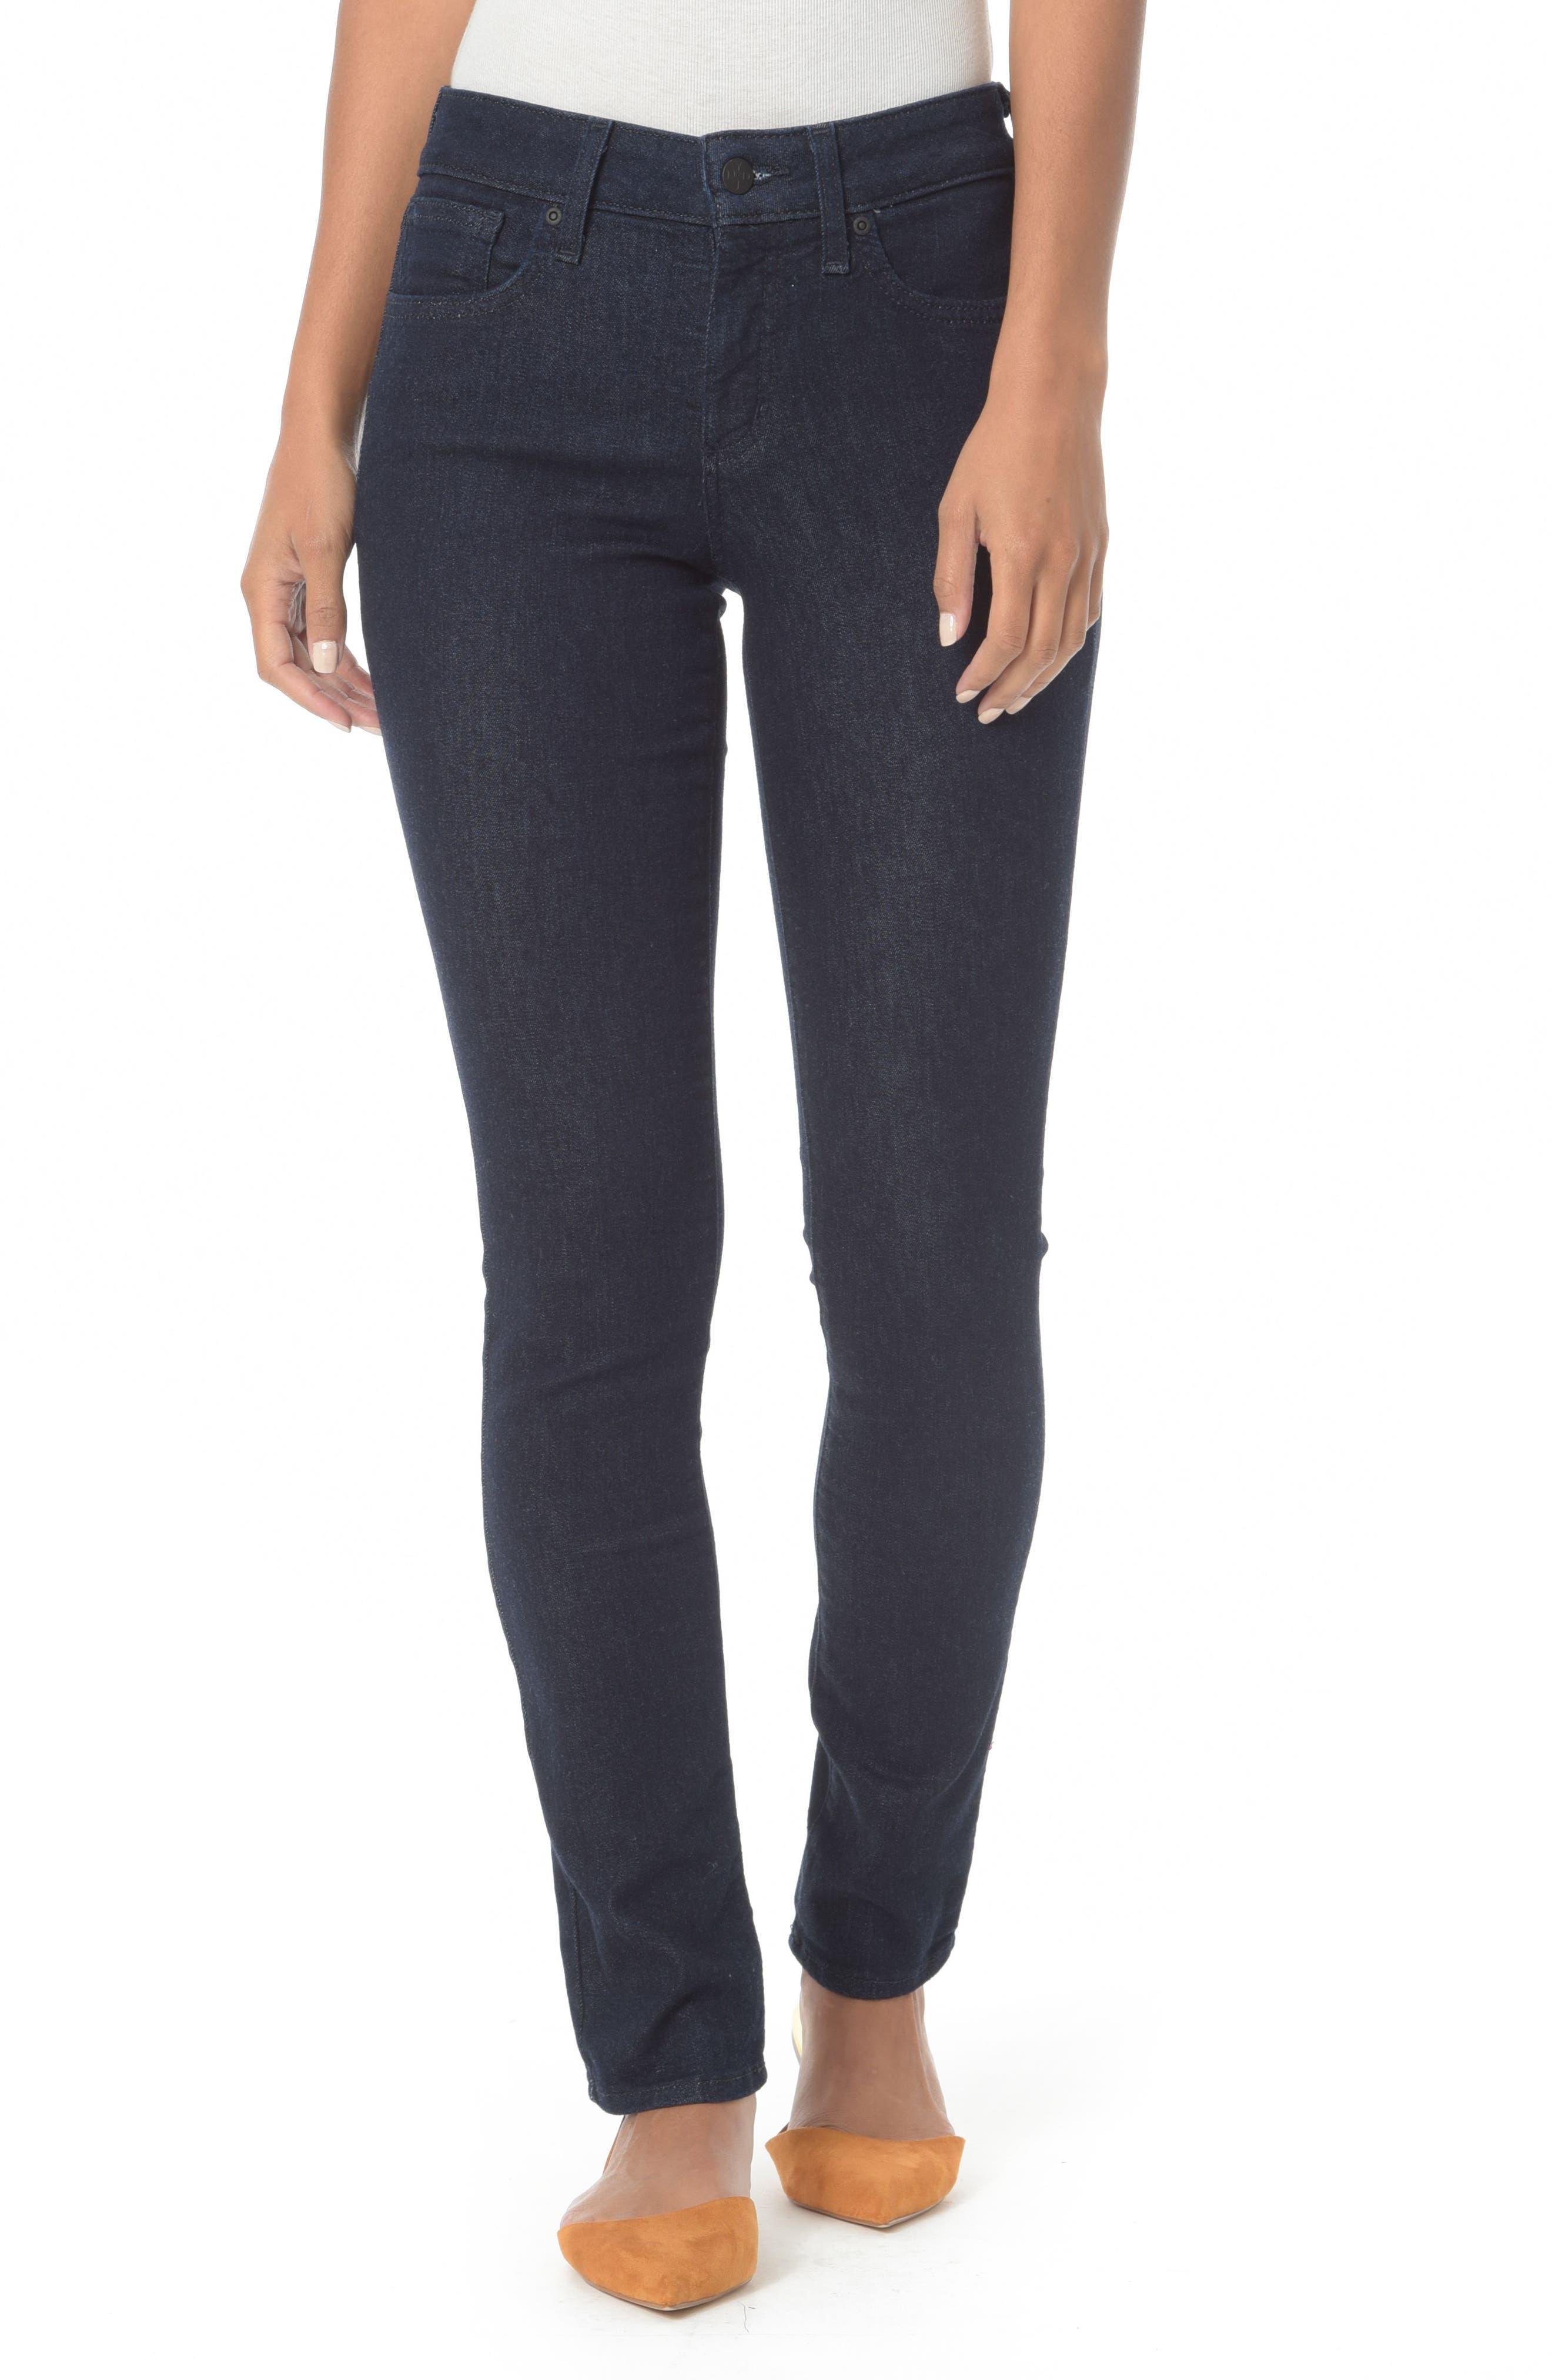 Main Image - NYDJ Alina Stretch Skinny Jeans (Regular & Petite)